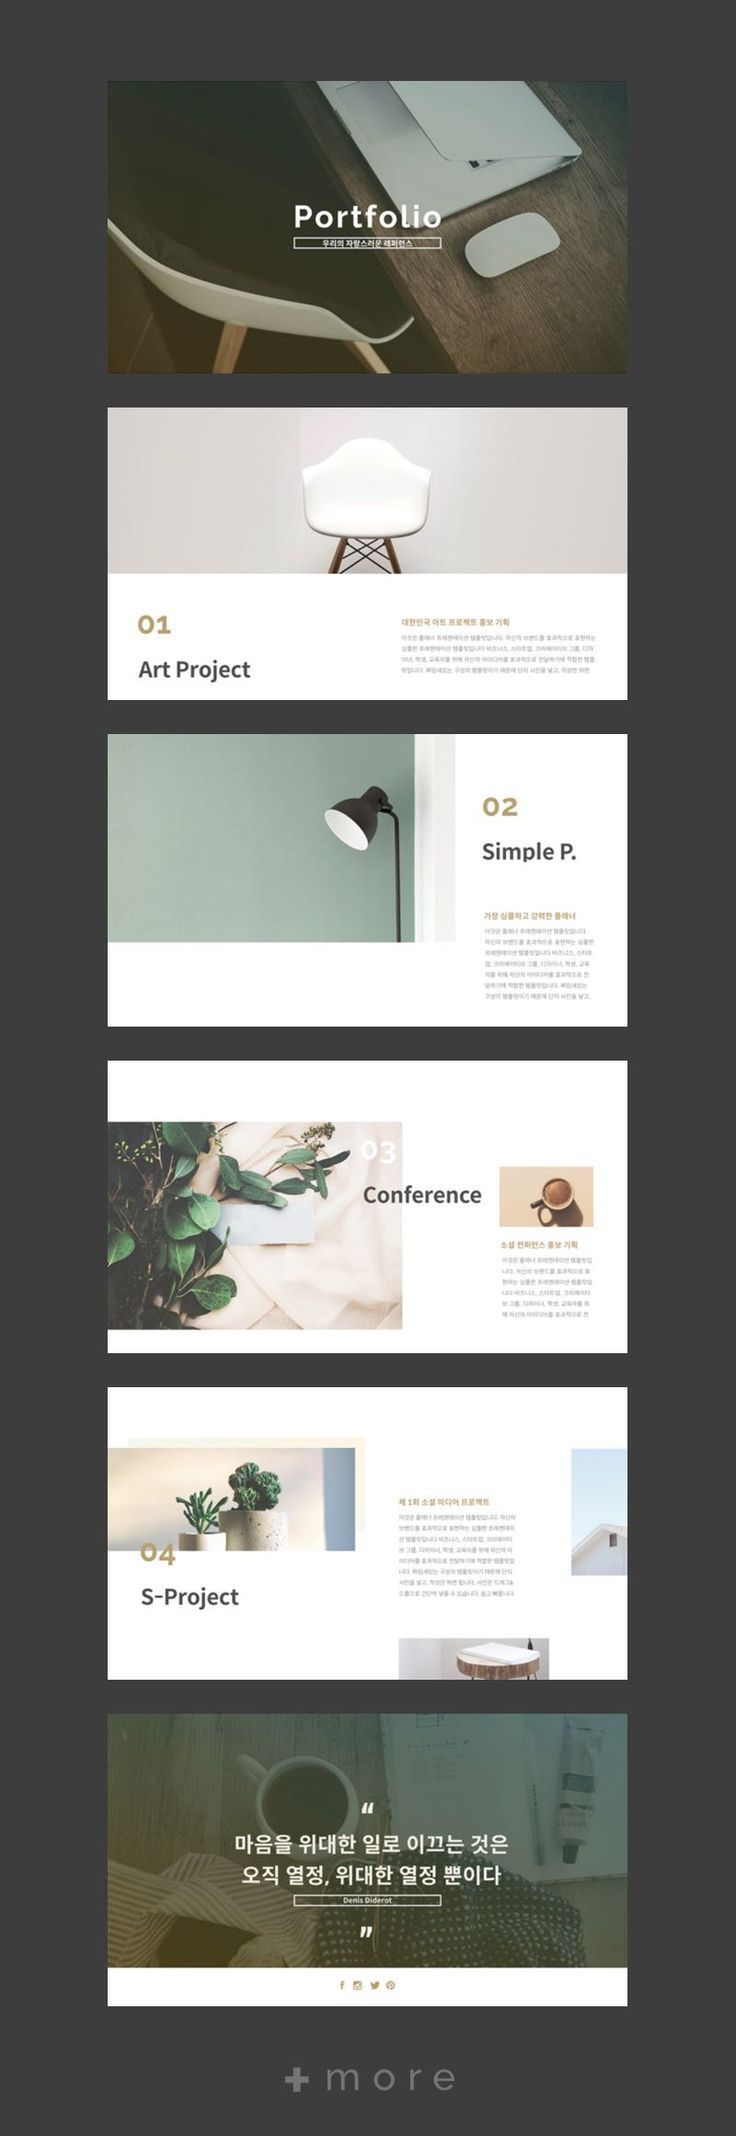 Photo of Simple layout design ideas #simple #minimal #ppt #… – #business #Design #I